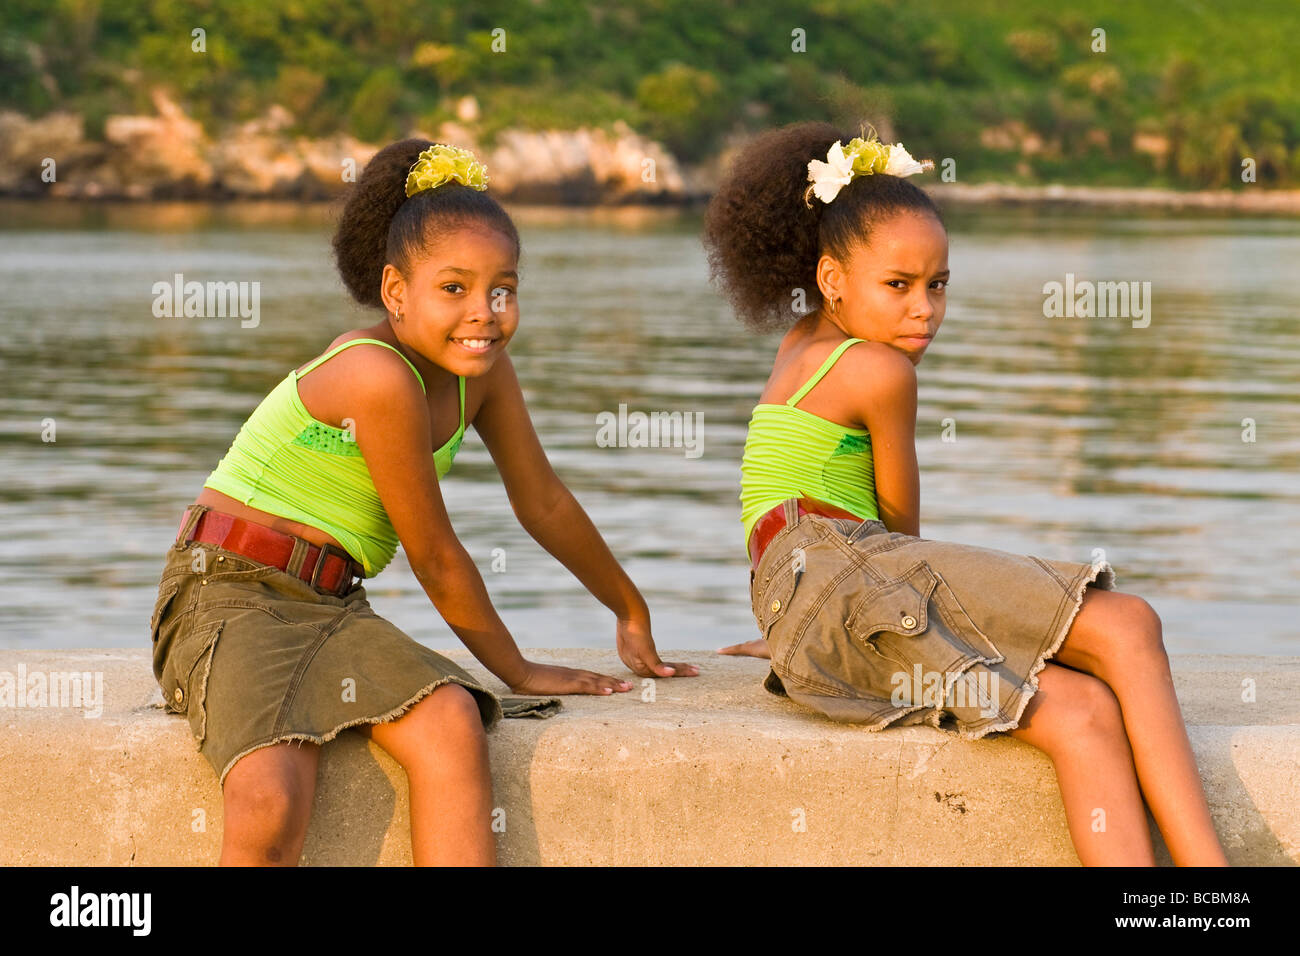 Havana Girls Stock Photos  Havana Girls Stock Images - Alamy-3001